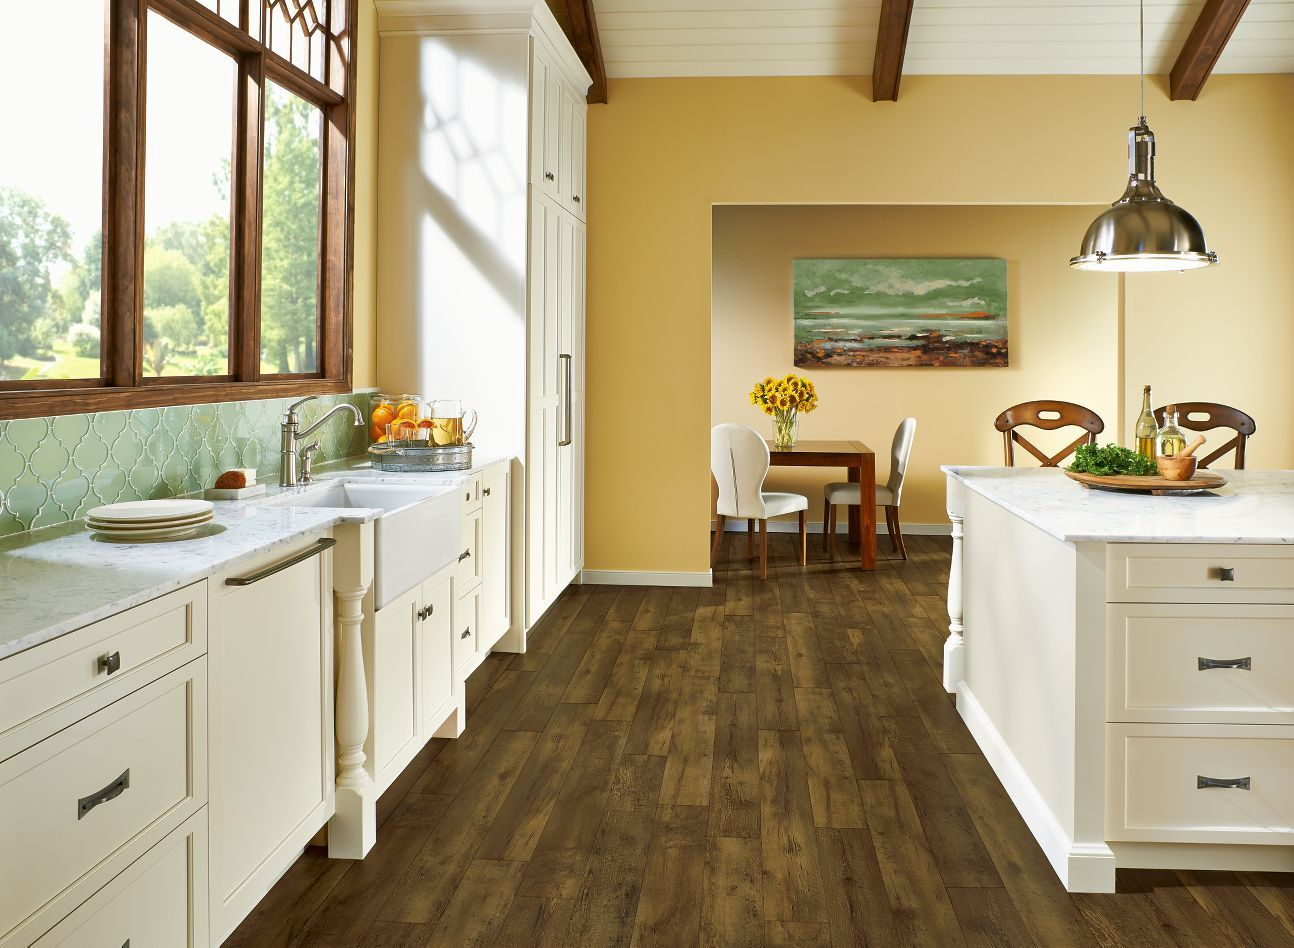 Armstrong Luxury Vinyl Plank Flooring LVP Farmhouse